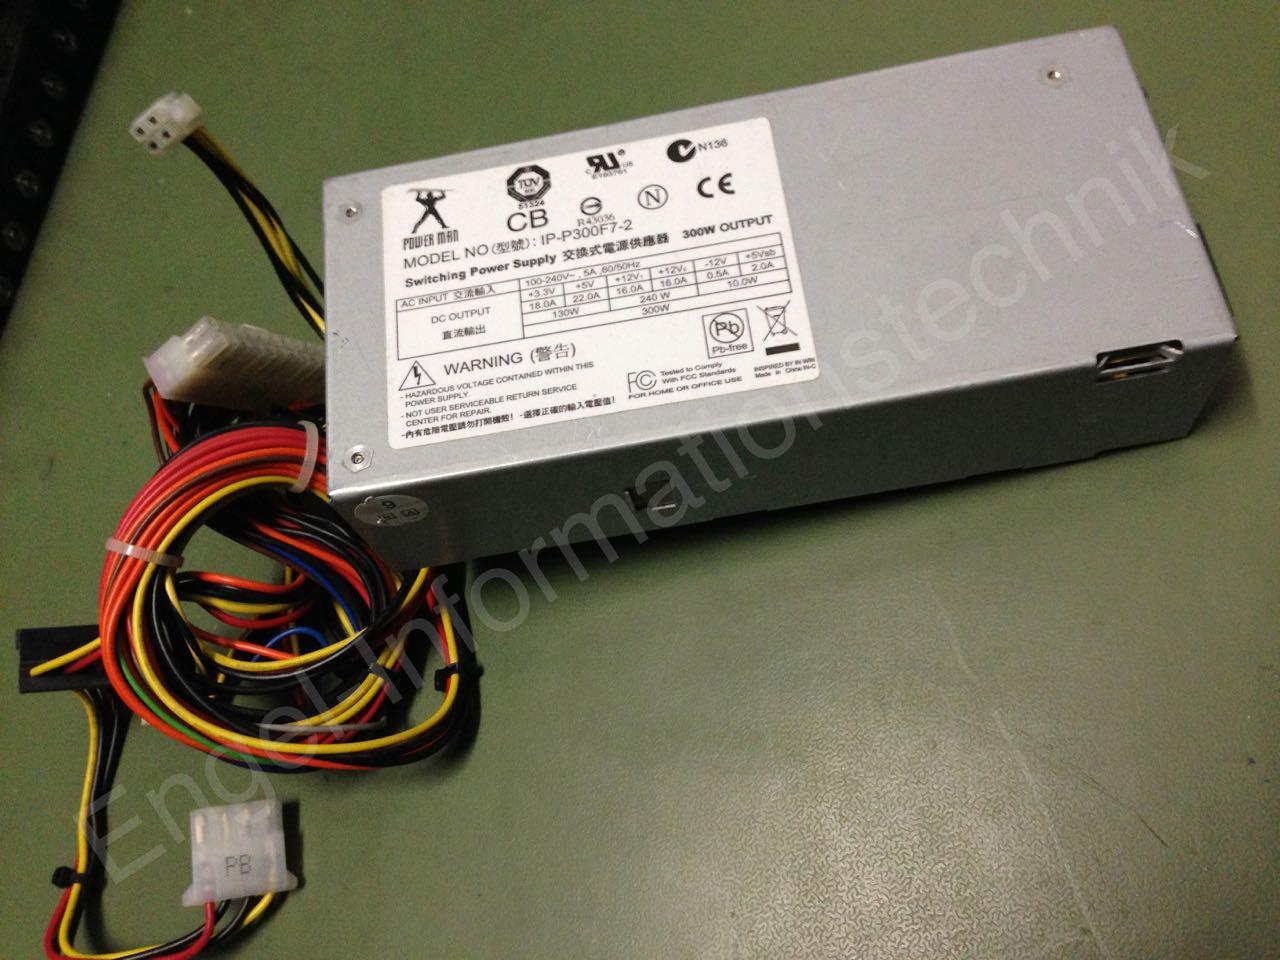 Power Man IP-P300F7-2